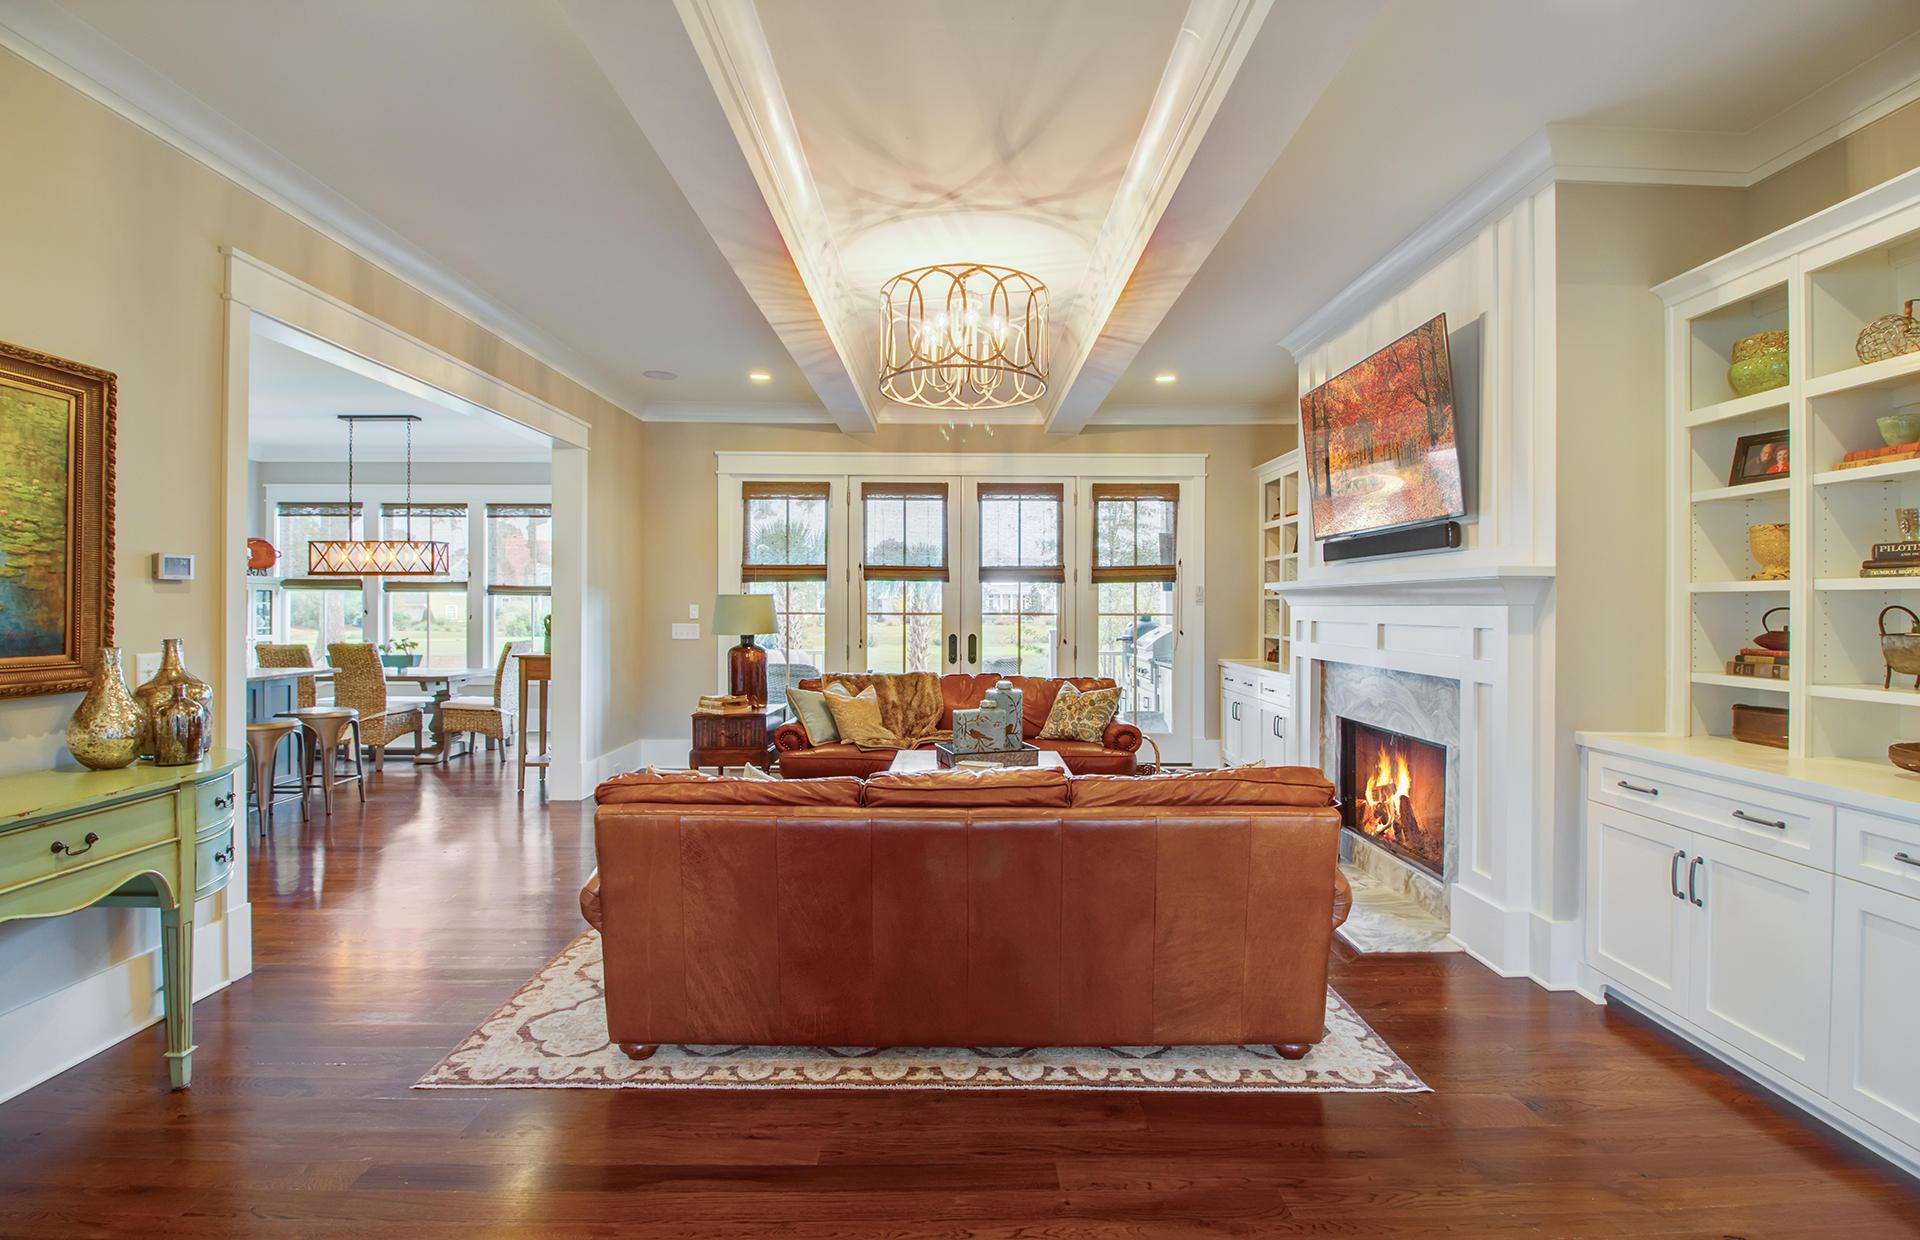 Daniel Island Park Homes For Sale - 117 Brailsford, Charleston, SC - 56